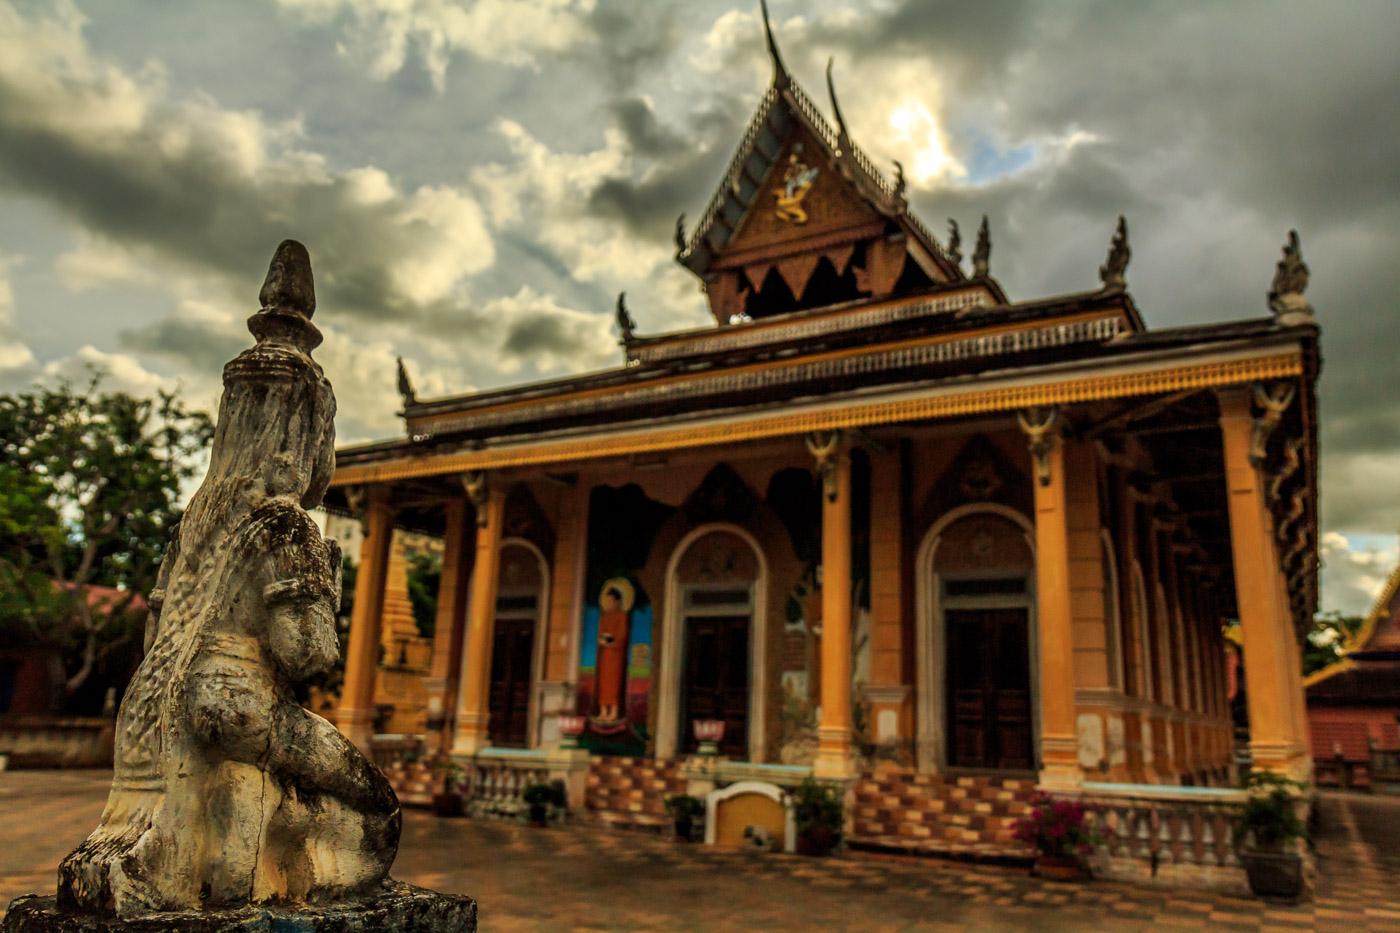 Admiring one of Battambang's many modern temples.